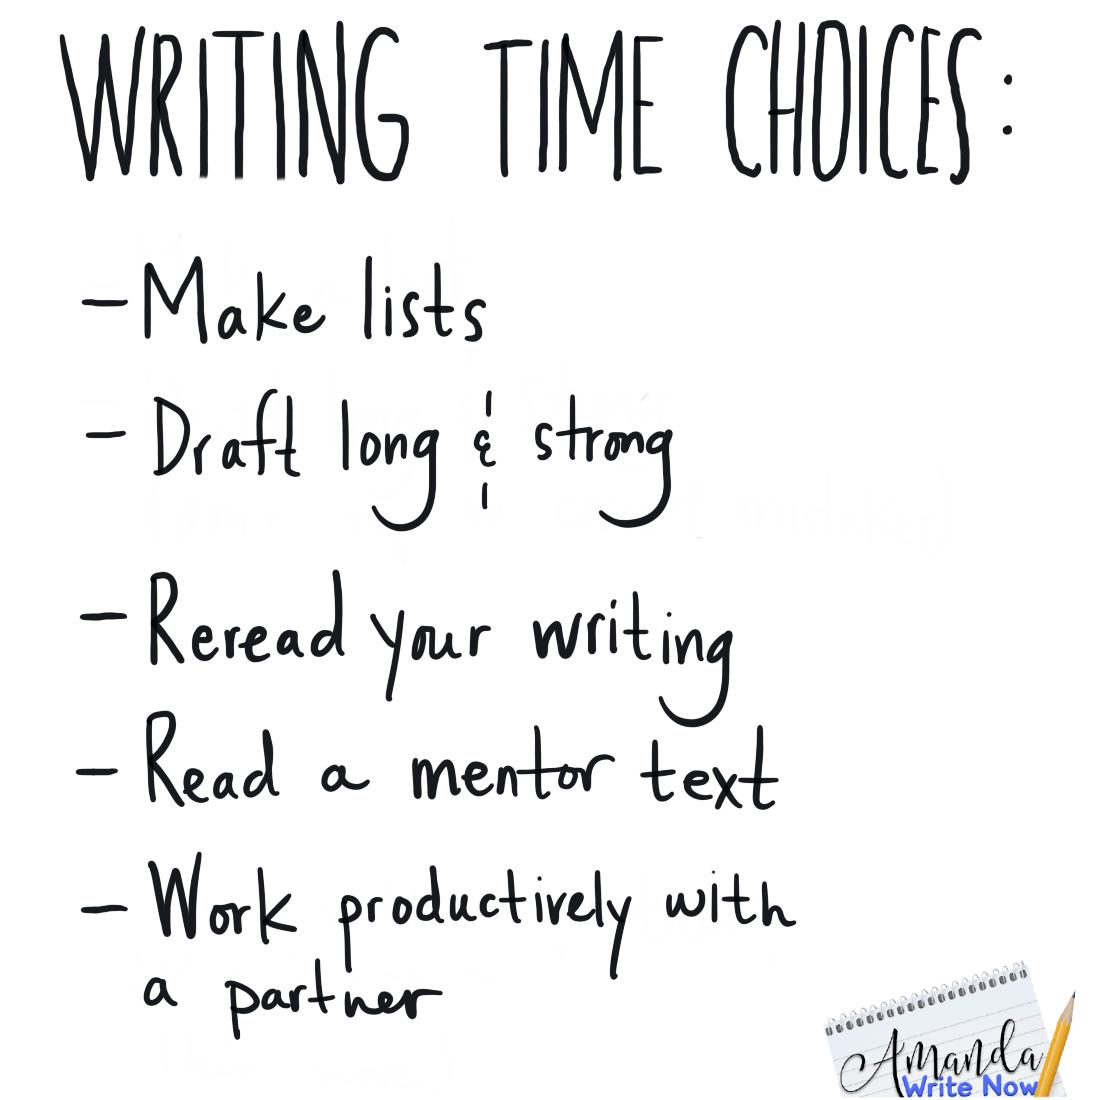 Writing Charts Amanda Write Now Writing Memes Writing Workshop Teaching Kids To Write